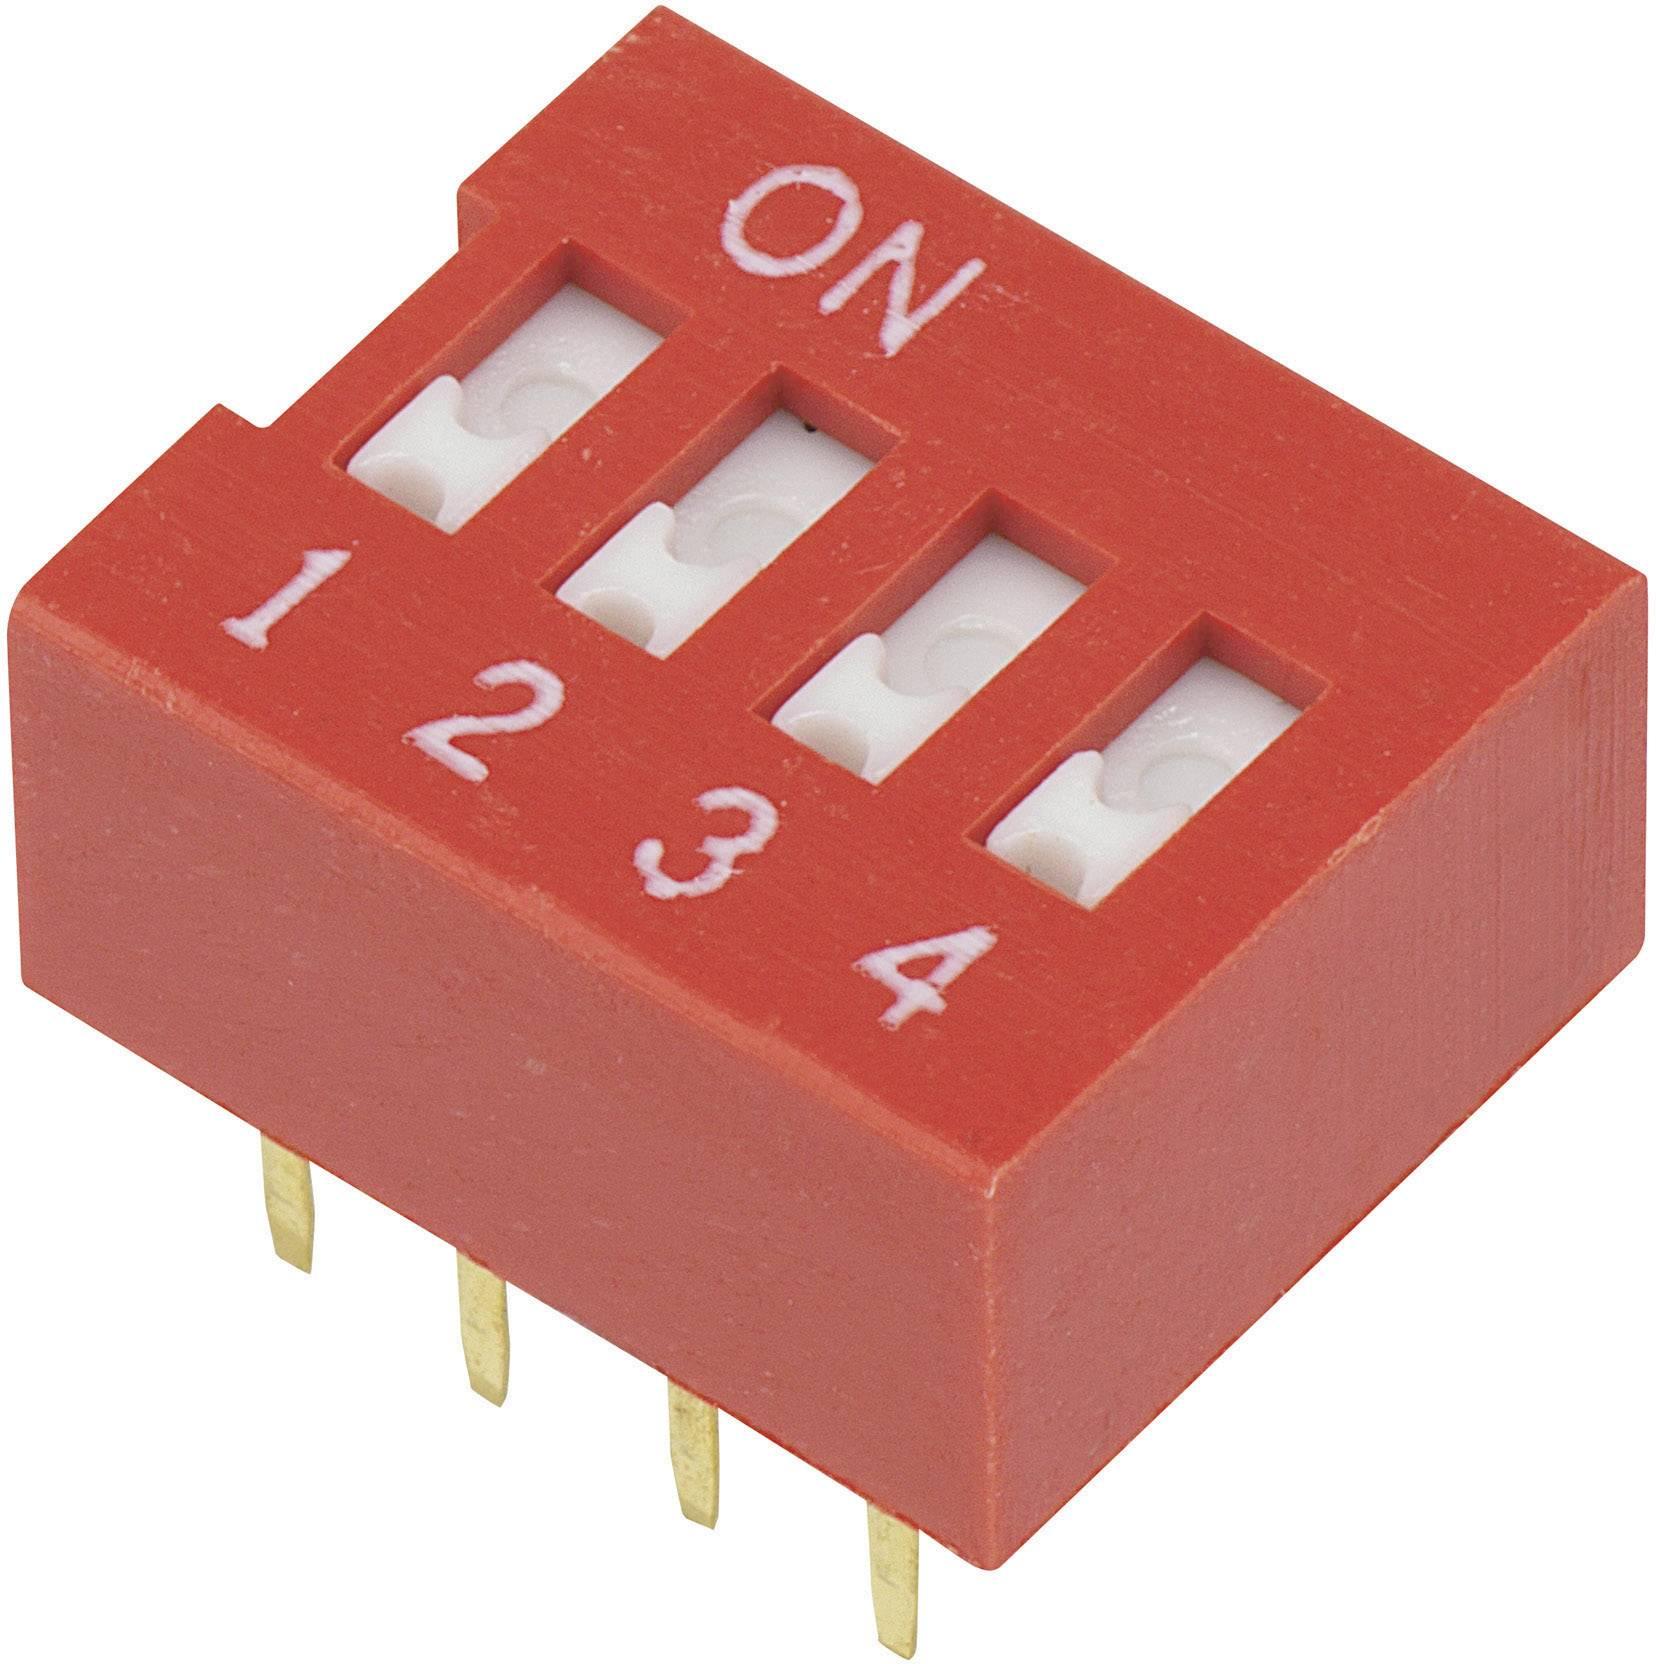 DIP spínač DSR-04, (š x v) 9,9 mm x 5,7 mm